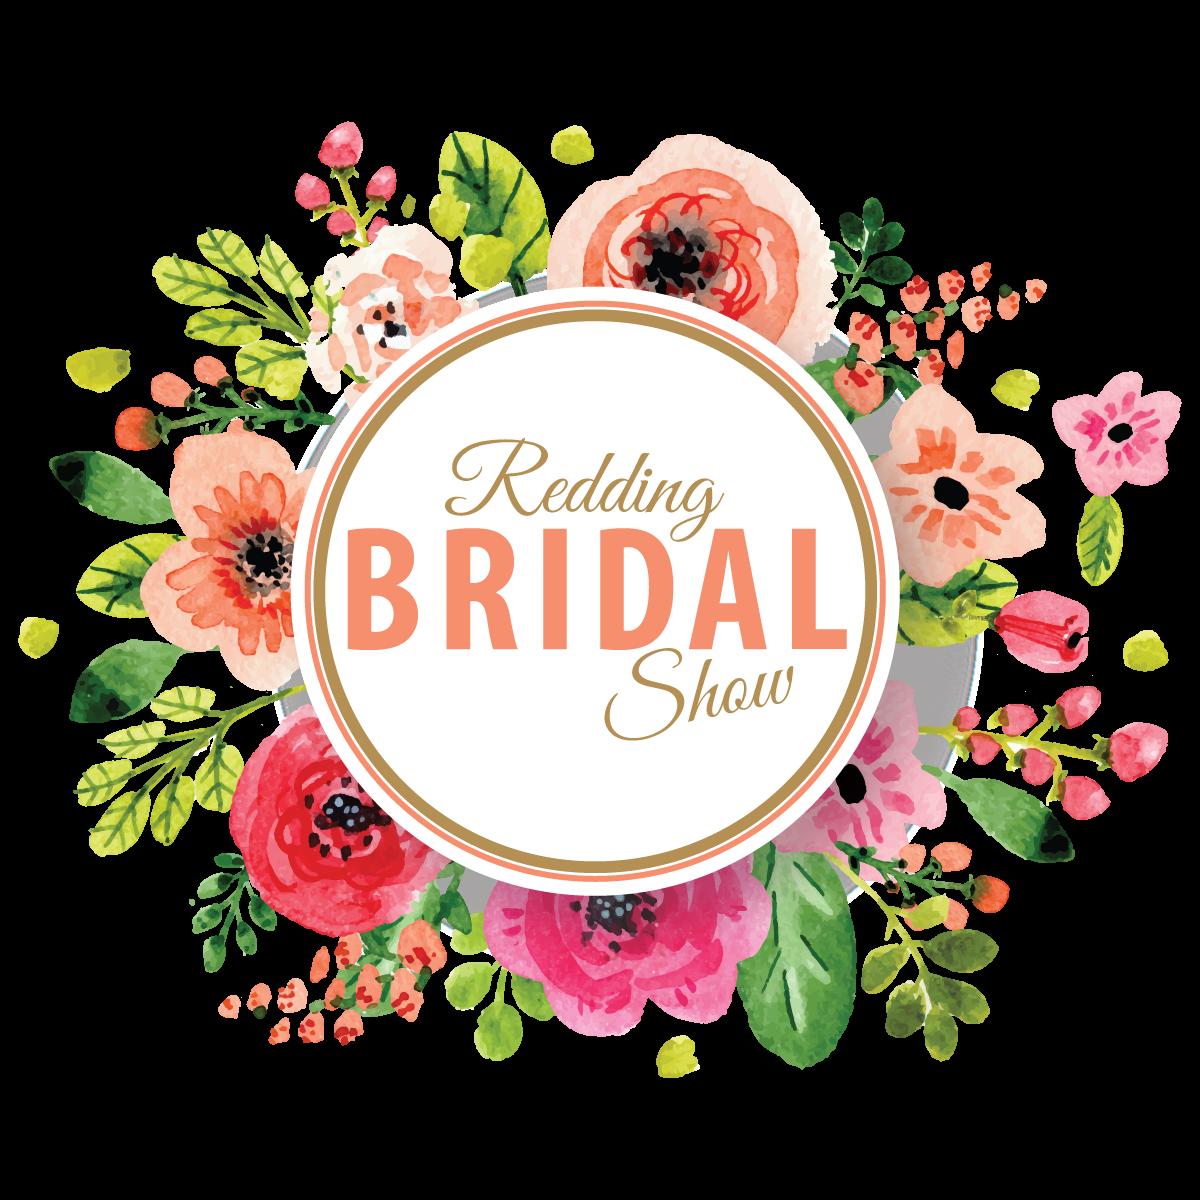 Copy of Redding Bridal Show